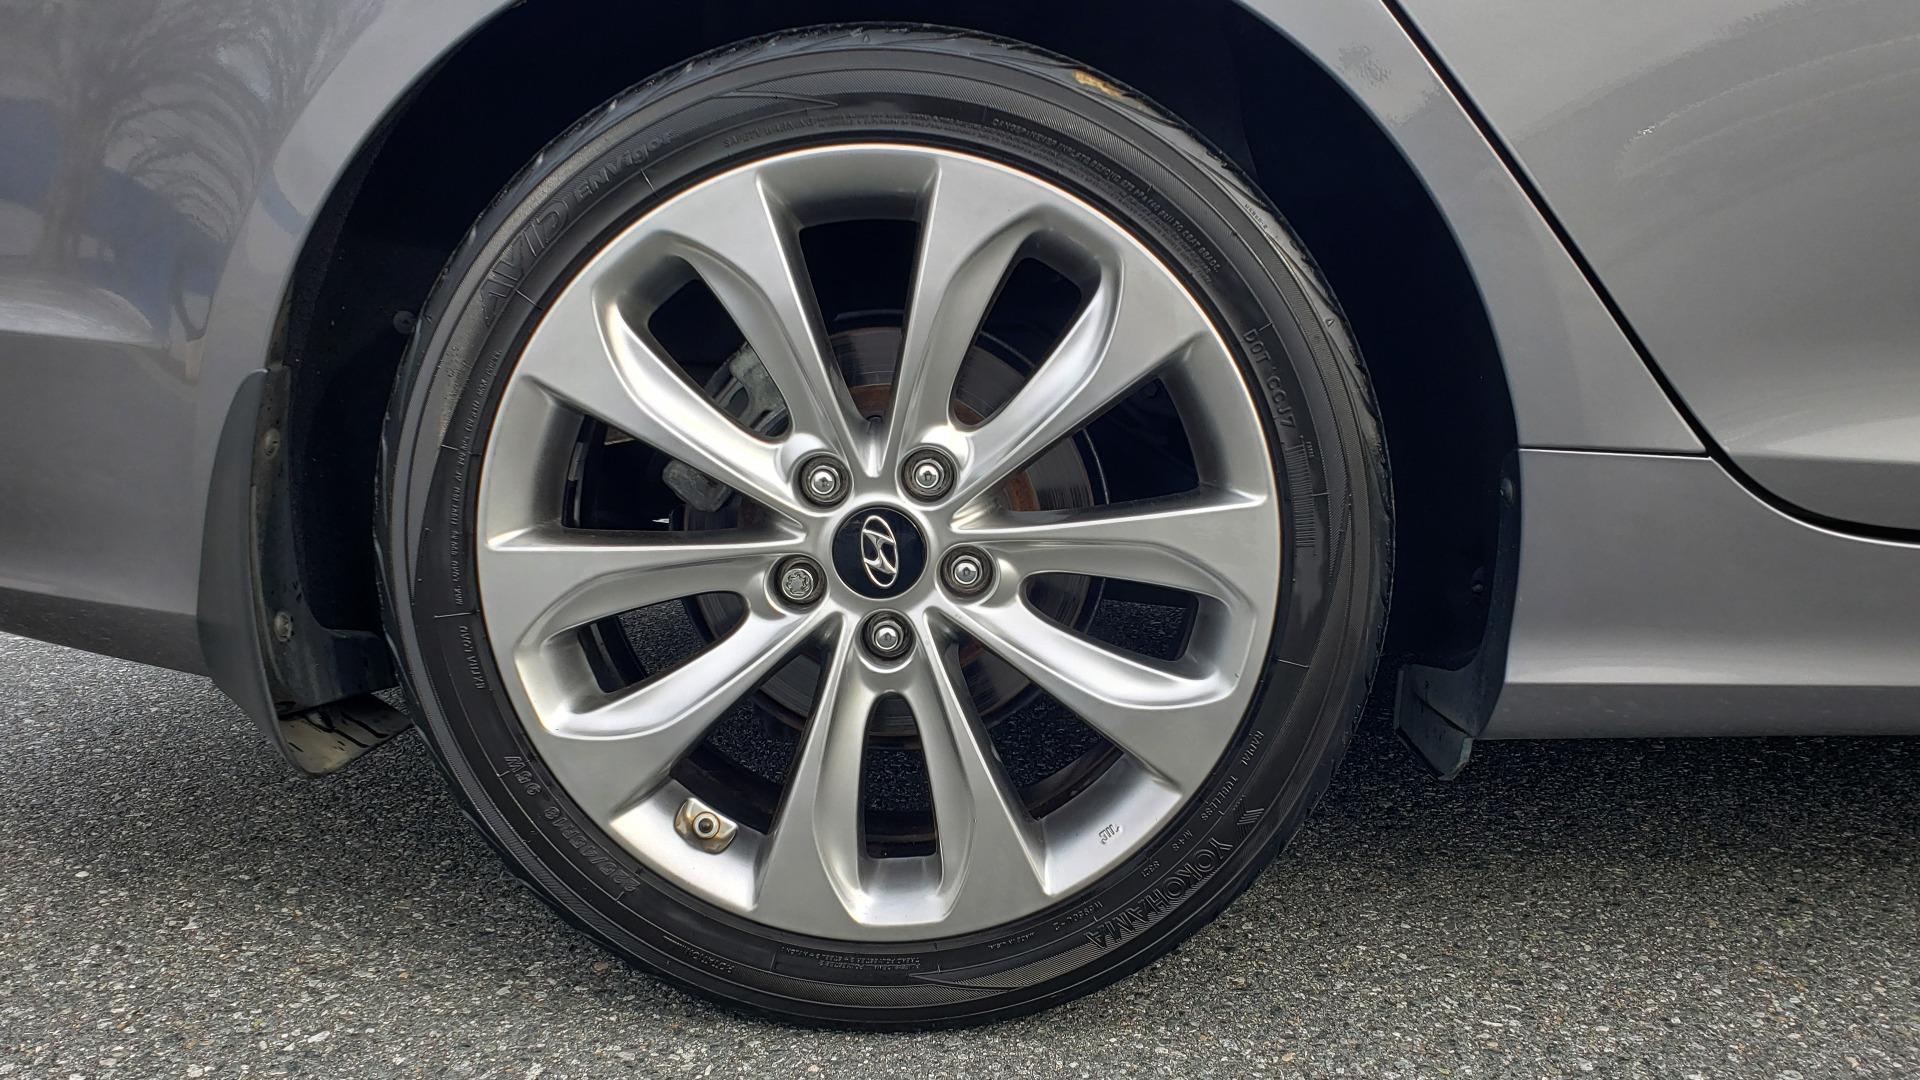 Used 2013 Hyundai SONATA SE AUTO / 2.4L 4-CYL / 6-SPD AUTO / VERY CLEAN for sale Sold at Formula Imports in Charlotte NC 28227 11